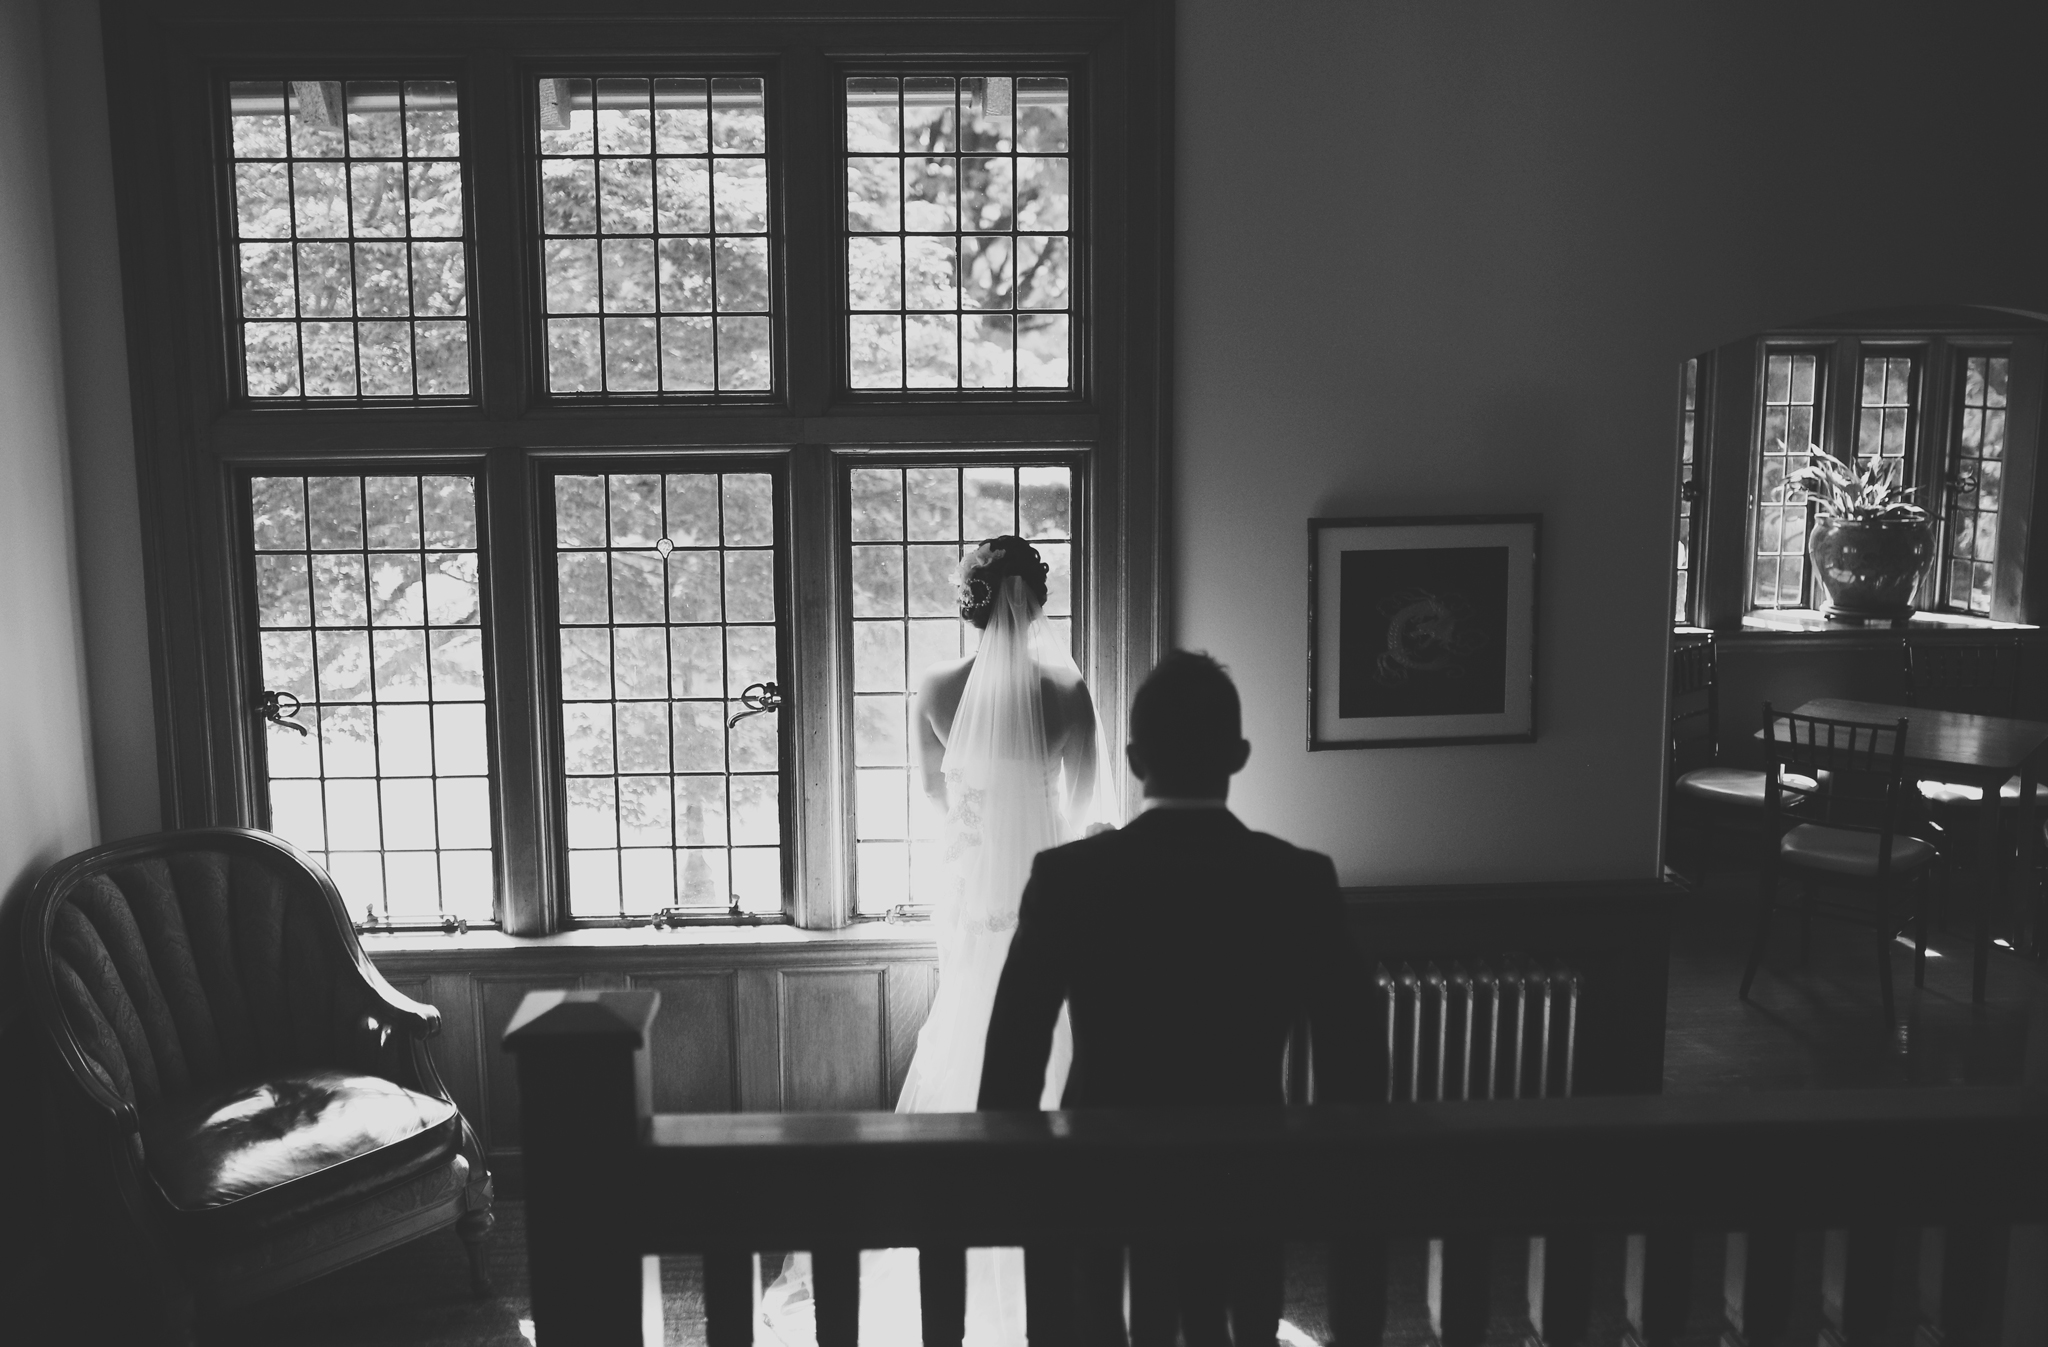 brock house wedding, vancouver wedding, vancouver wedding photographer, jennifer picard photography